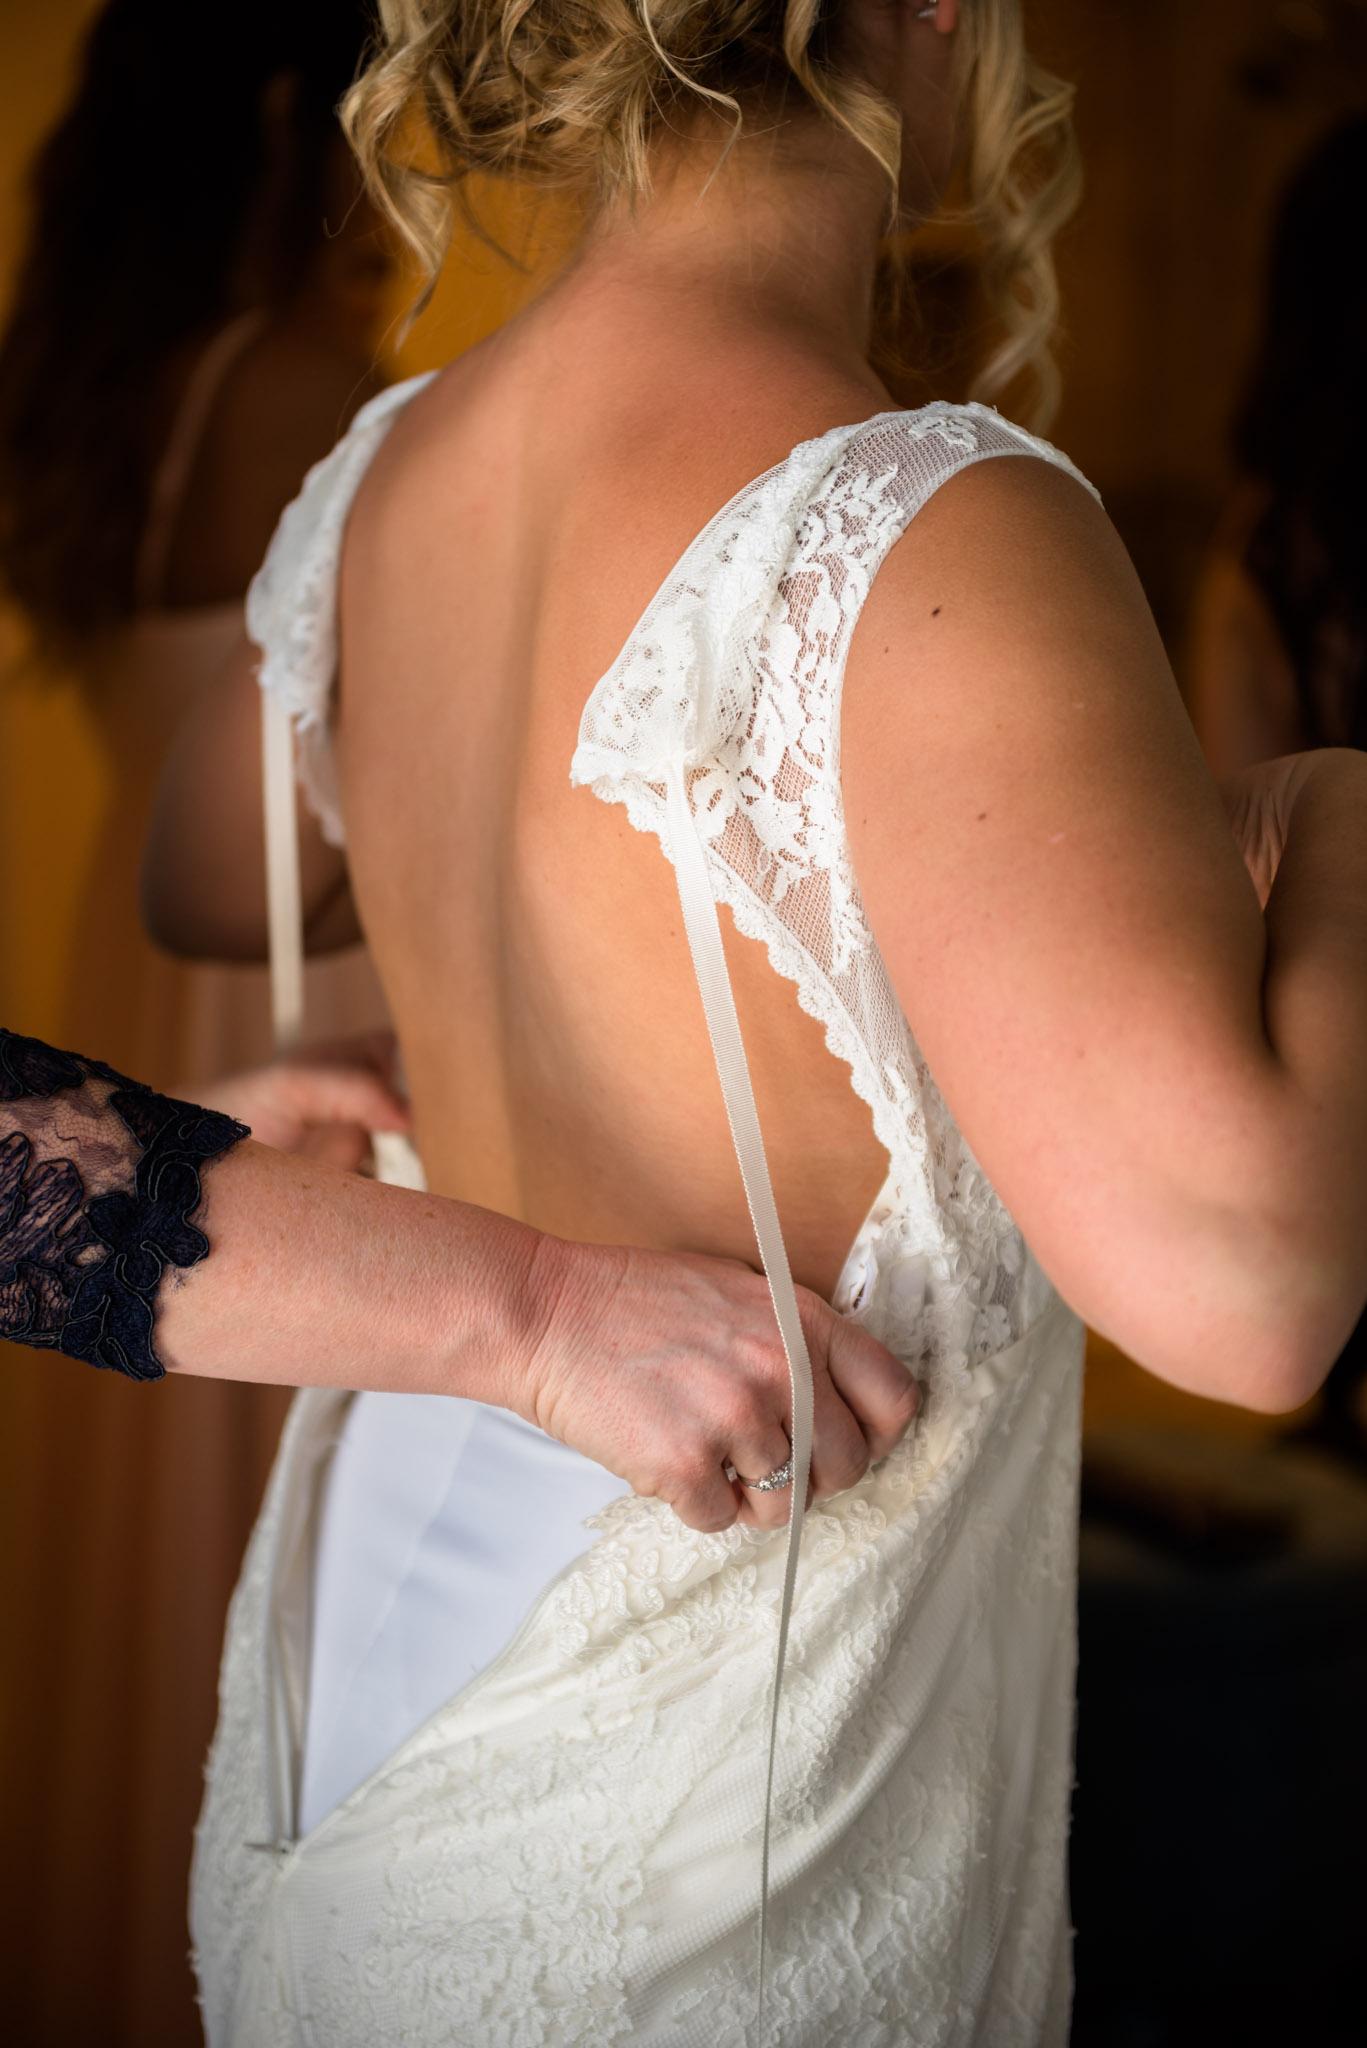 Avensole-Winery-Temecula-Wedding-Josh-and-Olivia-3005.JPG